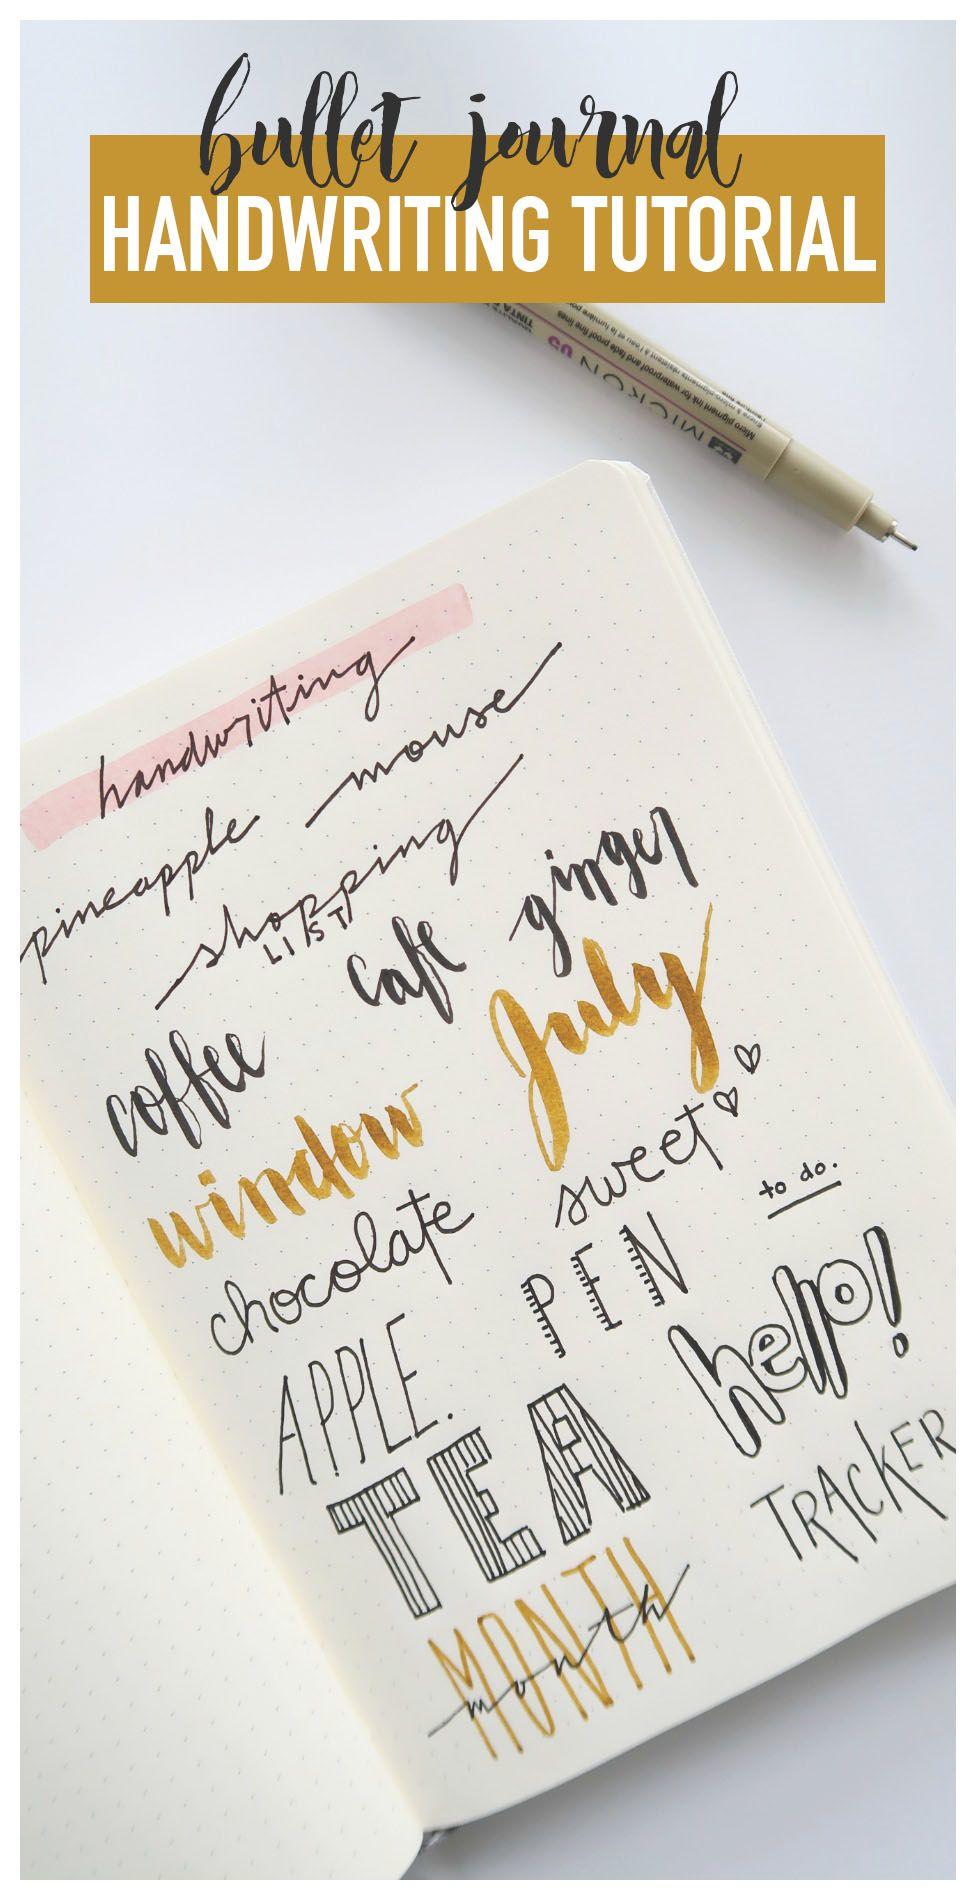 Bullet Journaling HANDWRITING TUTORIAL Brush Lettering And Cursive For Beginners